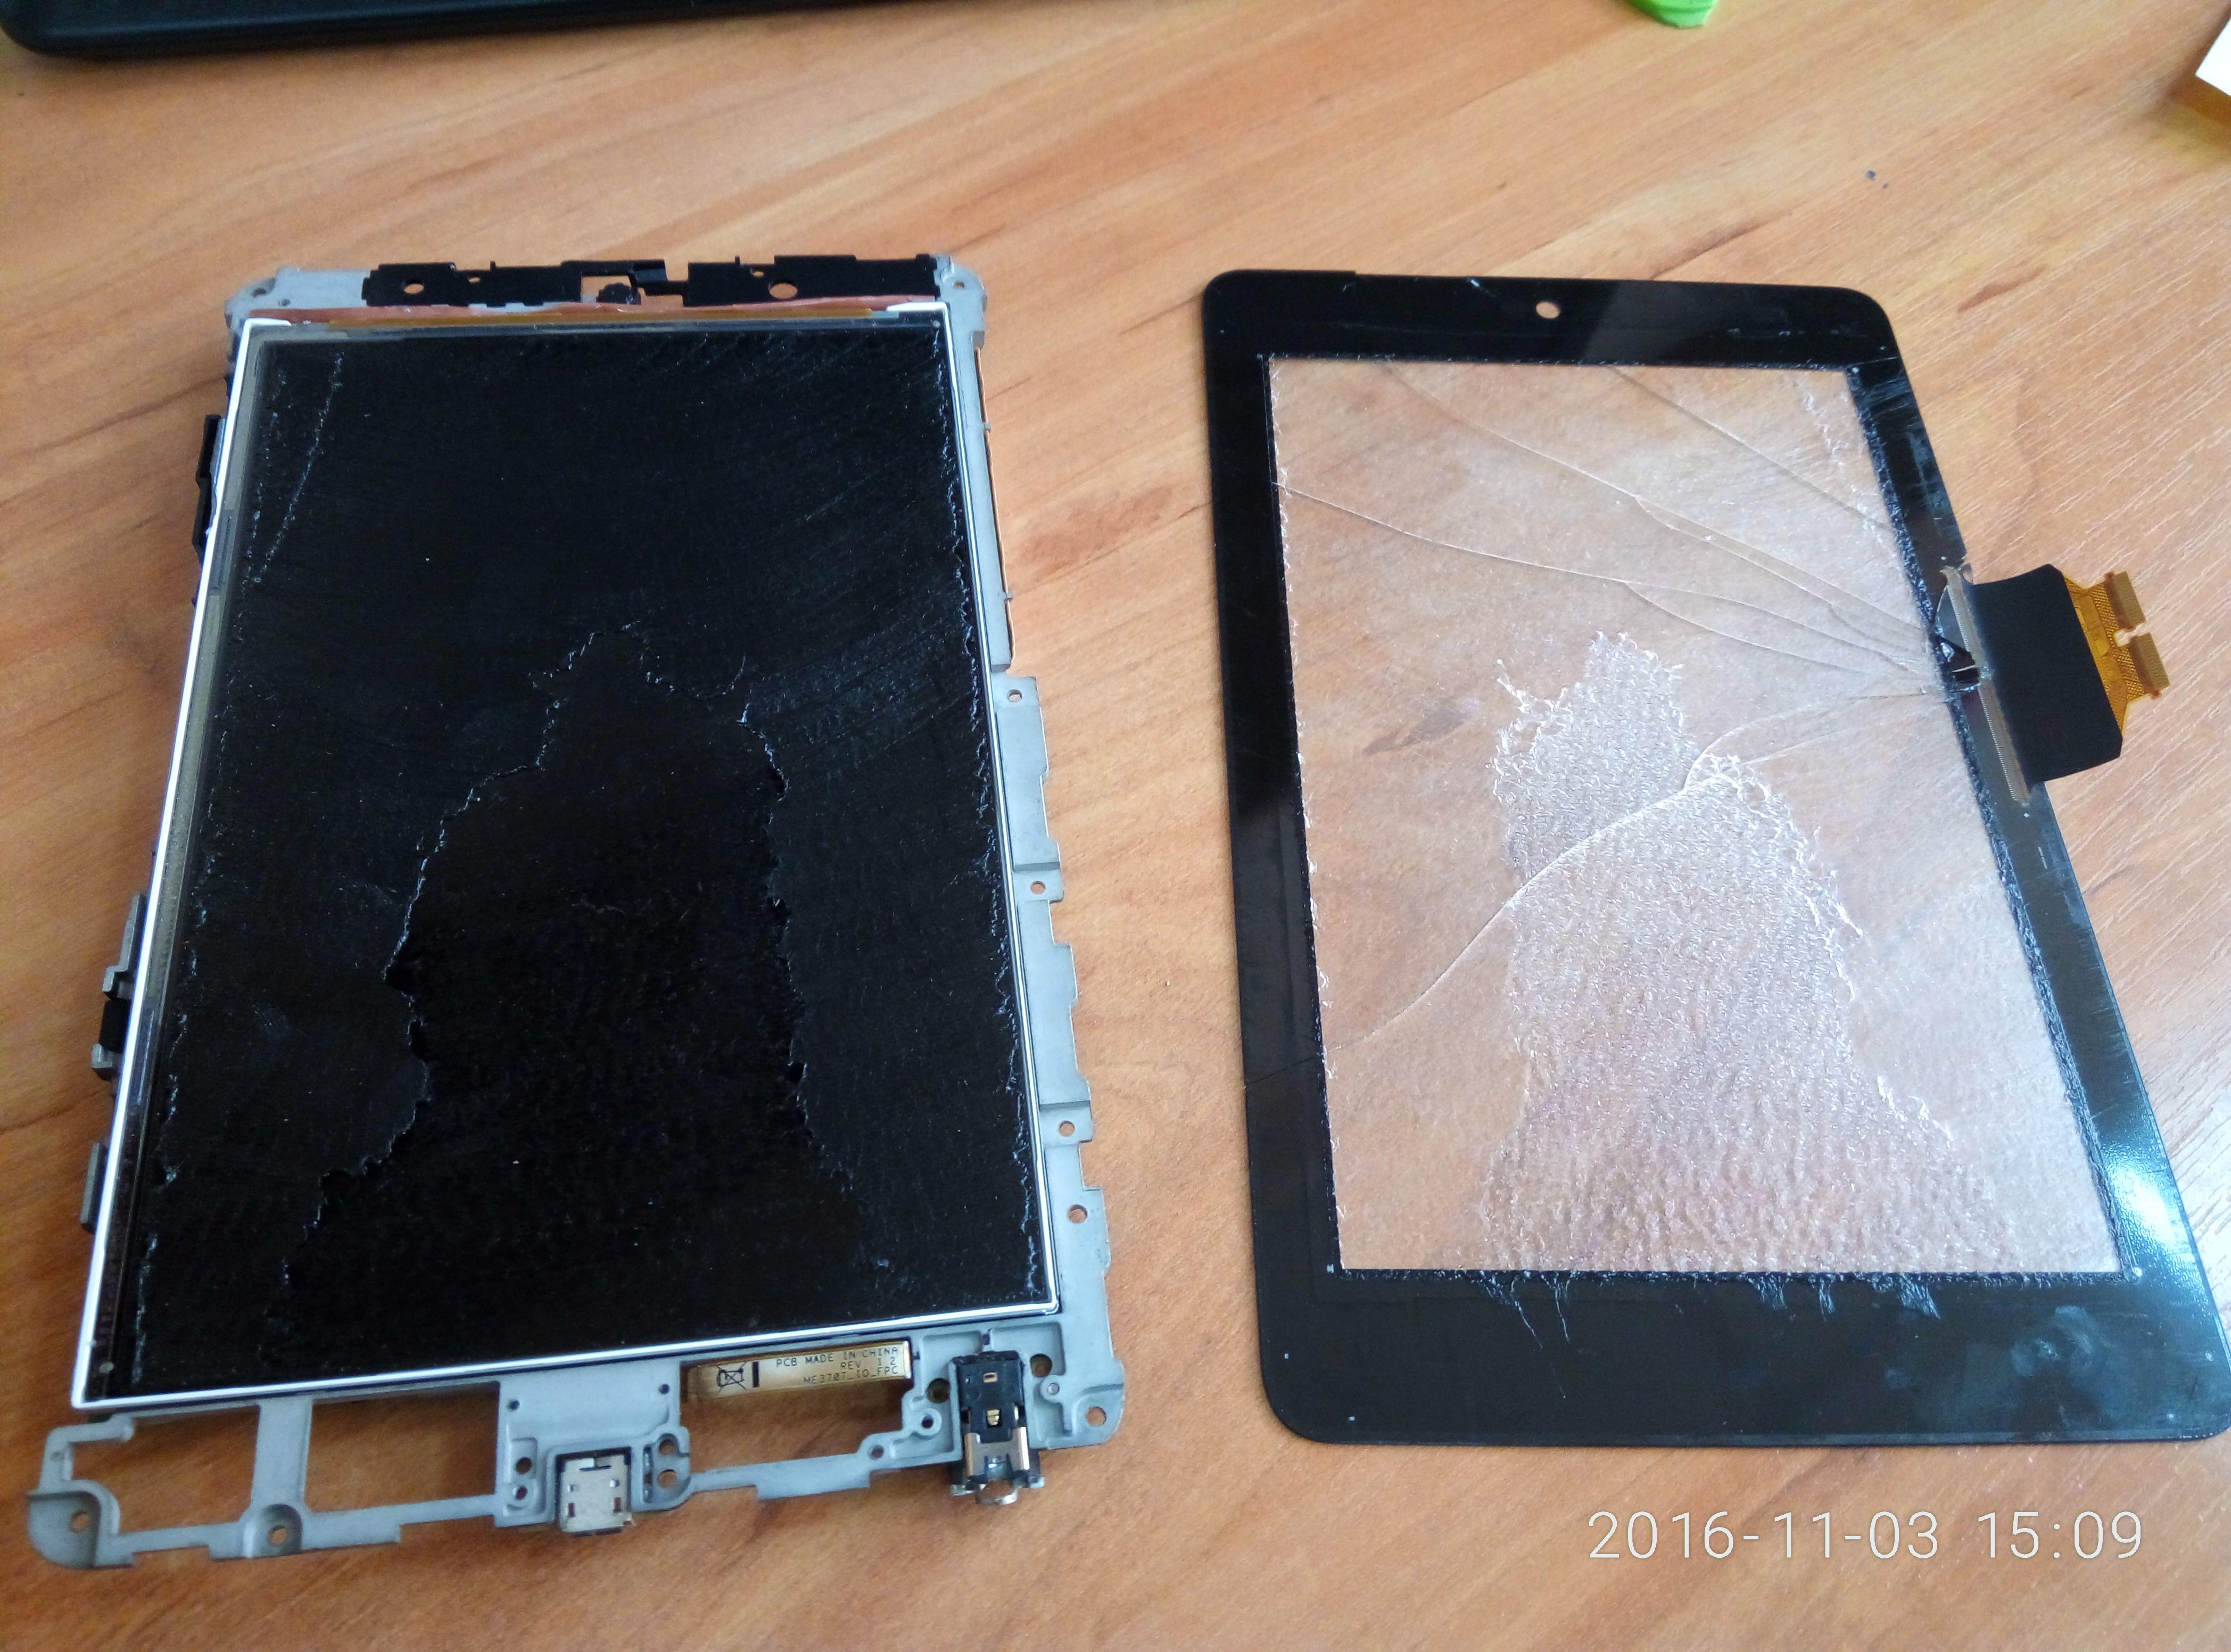 Замена дисплея планшета своими руками 78